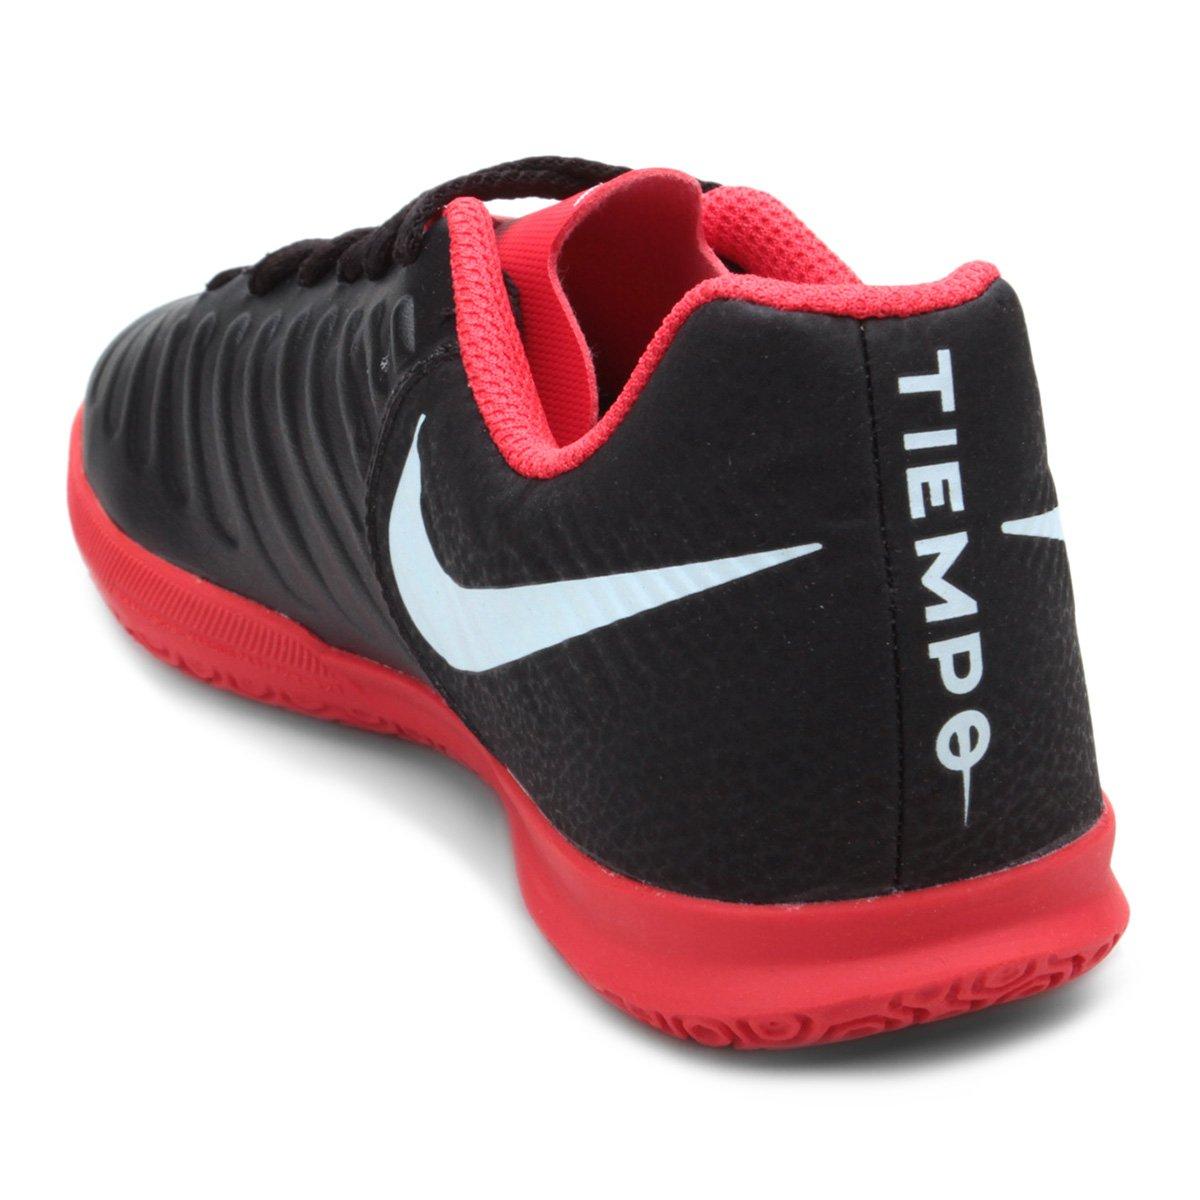 d10f1186f7 Chuteira Futsal Infantil Nike Tiempo Legend 7 Club IC - Compre Agora ...